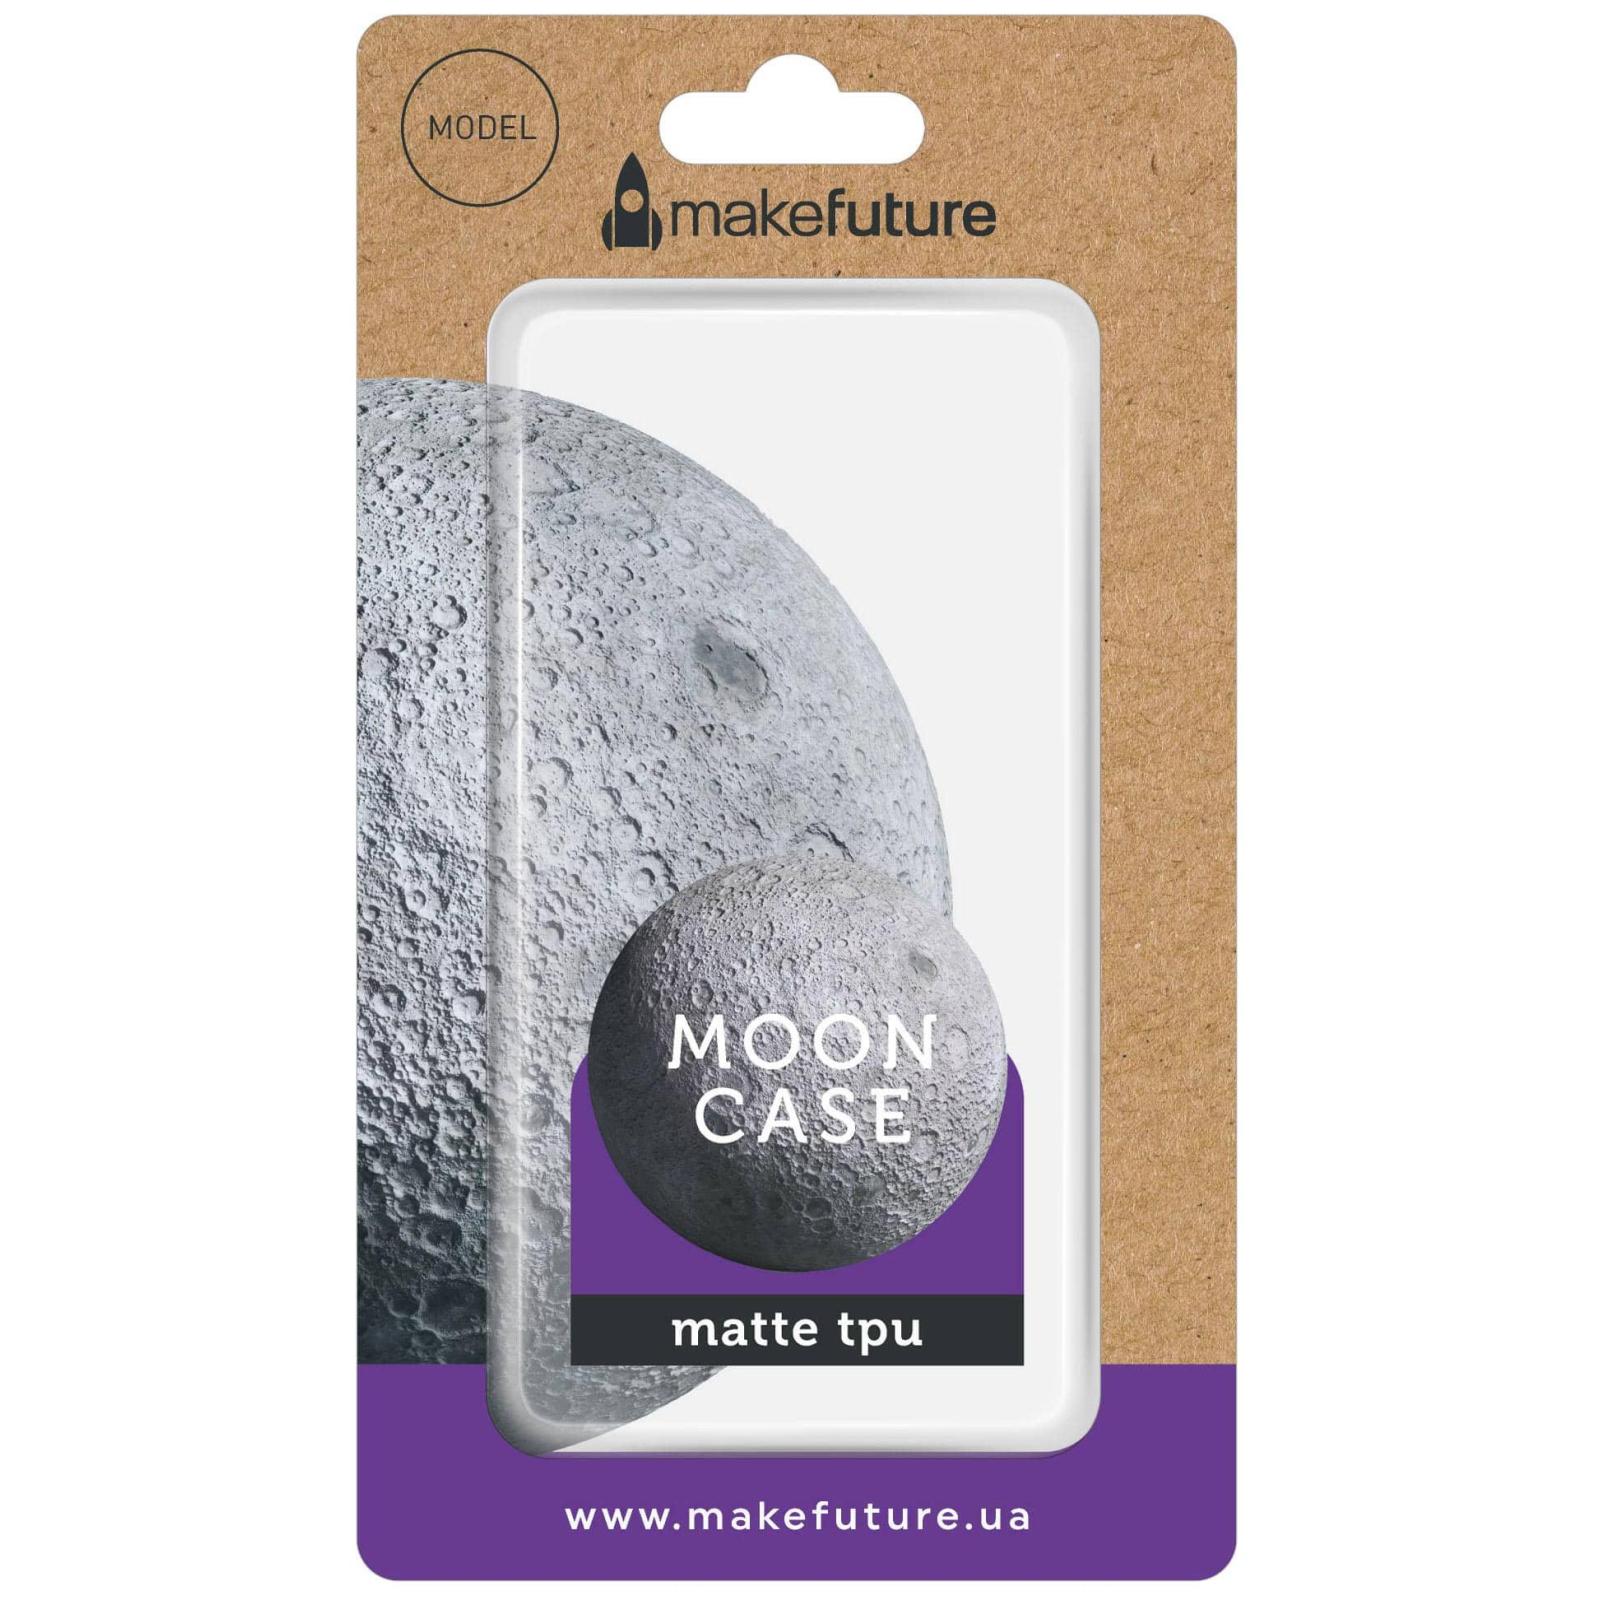 Чехол для моб. телефона MakeFuture Moon Case (TPU) для Huawei Mate 10 Lite Blue (MCM-HUM10LBL) изображение 4